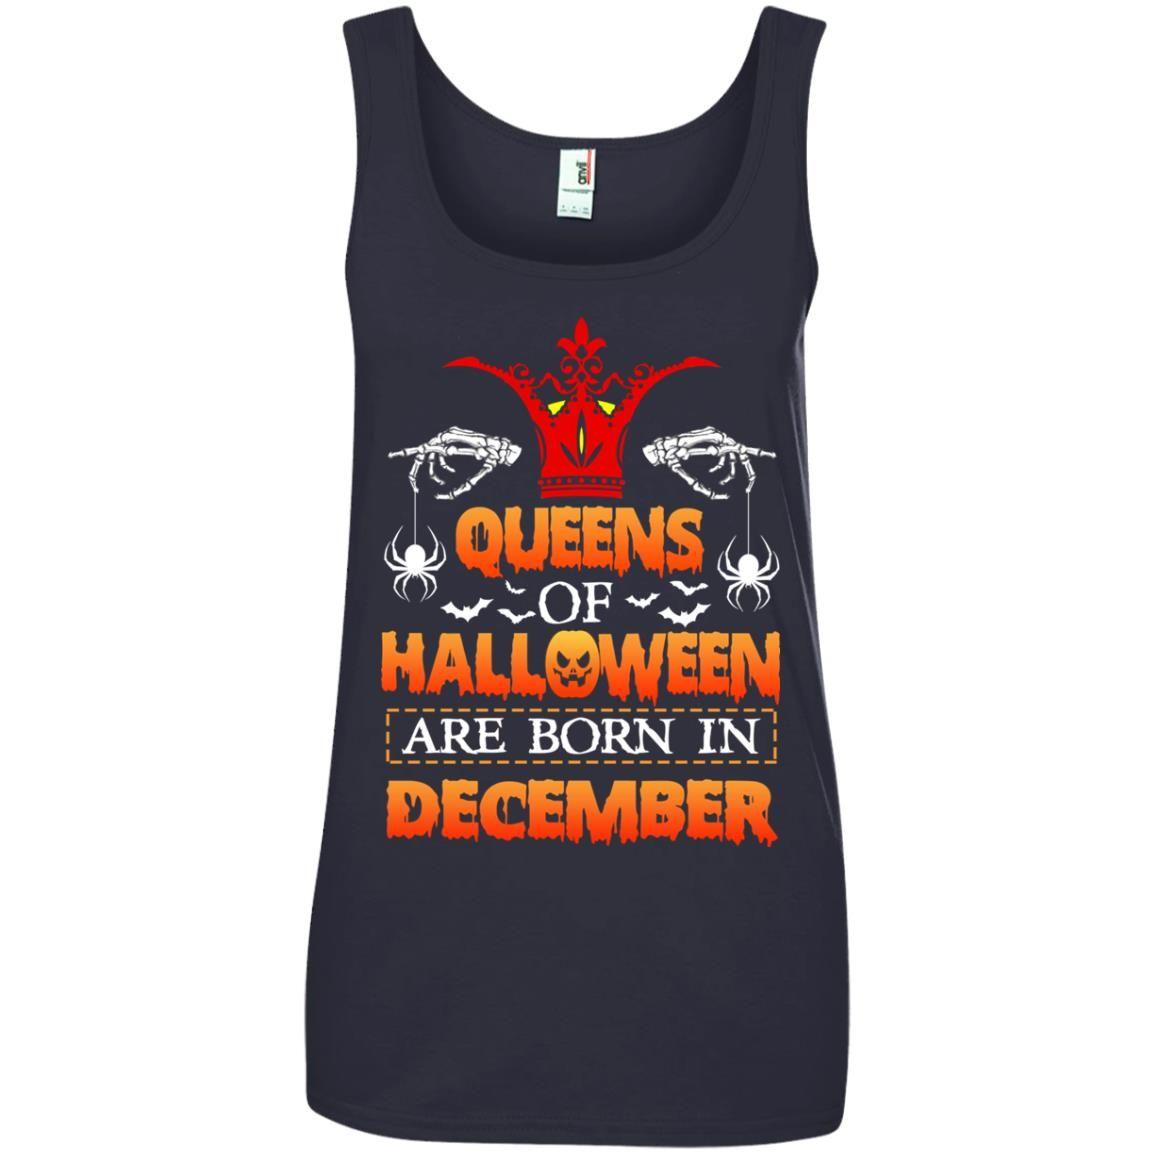 image 969 - Queens of Halloween are born in December shirt, tank top, hoodie